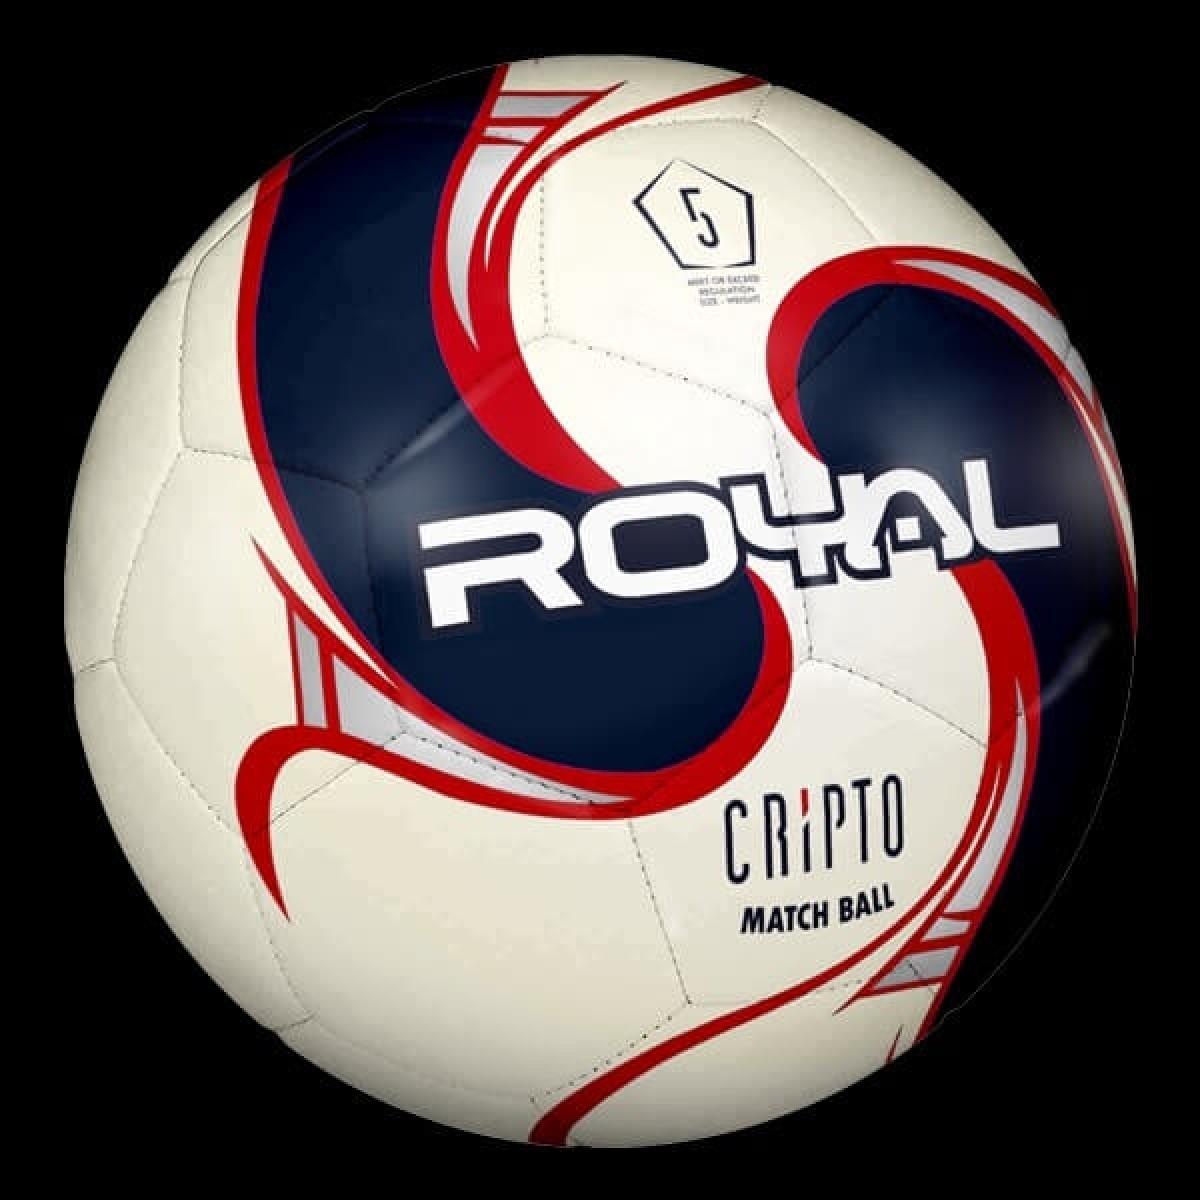 Royal Cripto fodbold blå